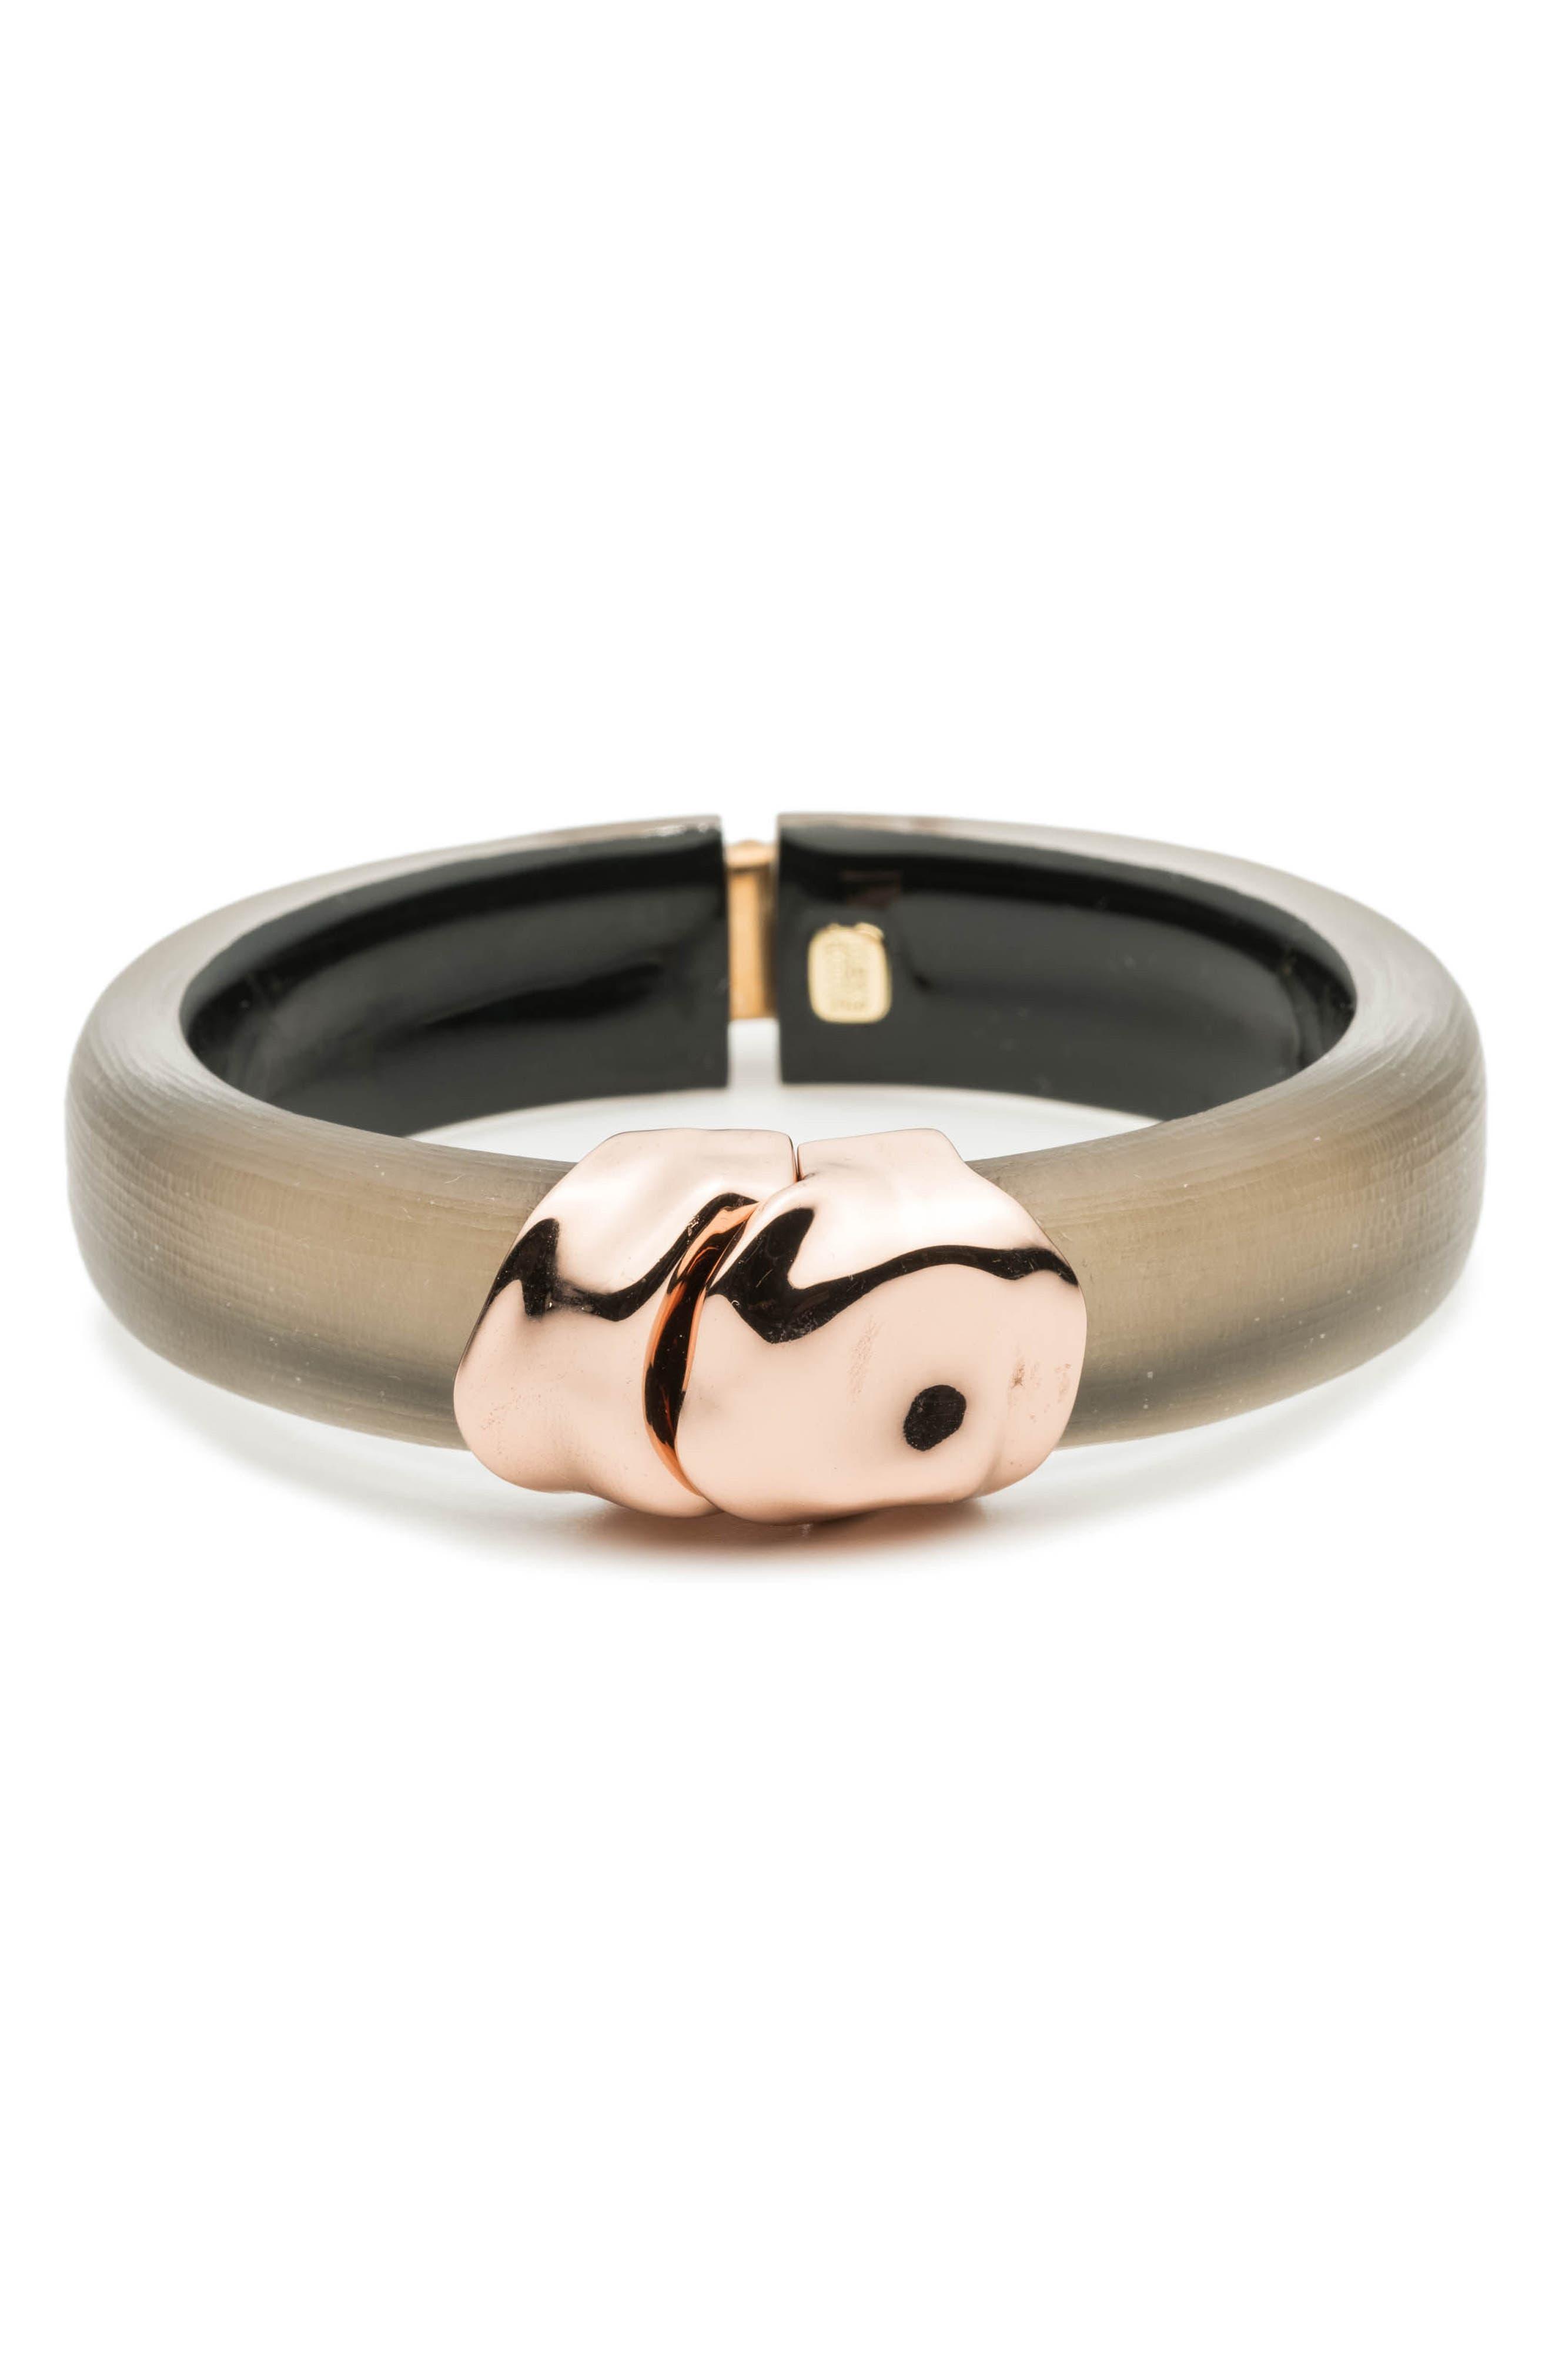 Metal Lucite<sup>®</sup> Hinge Bracelet,                             Main thumbnail 1, color,                             WARM GREY